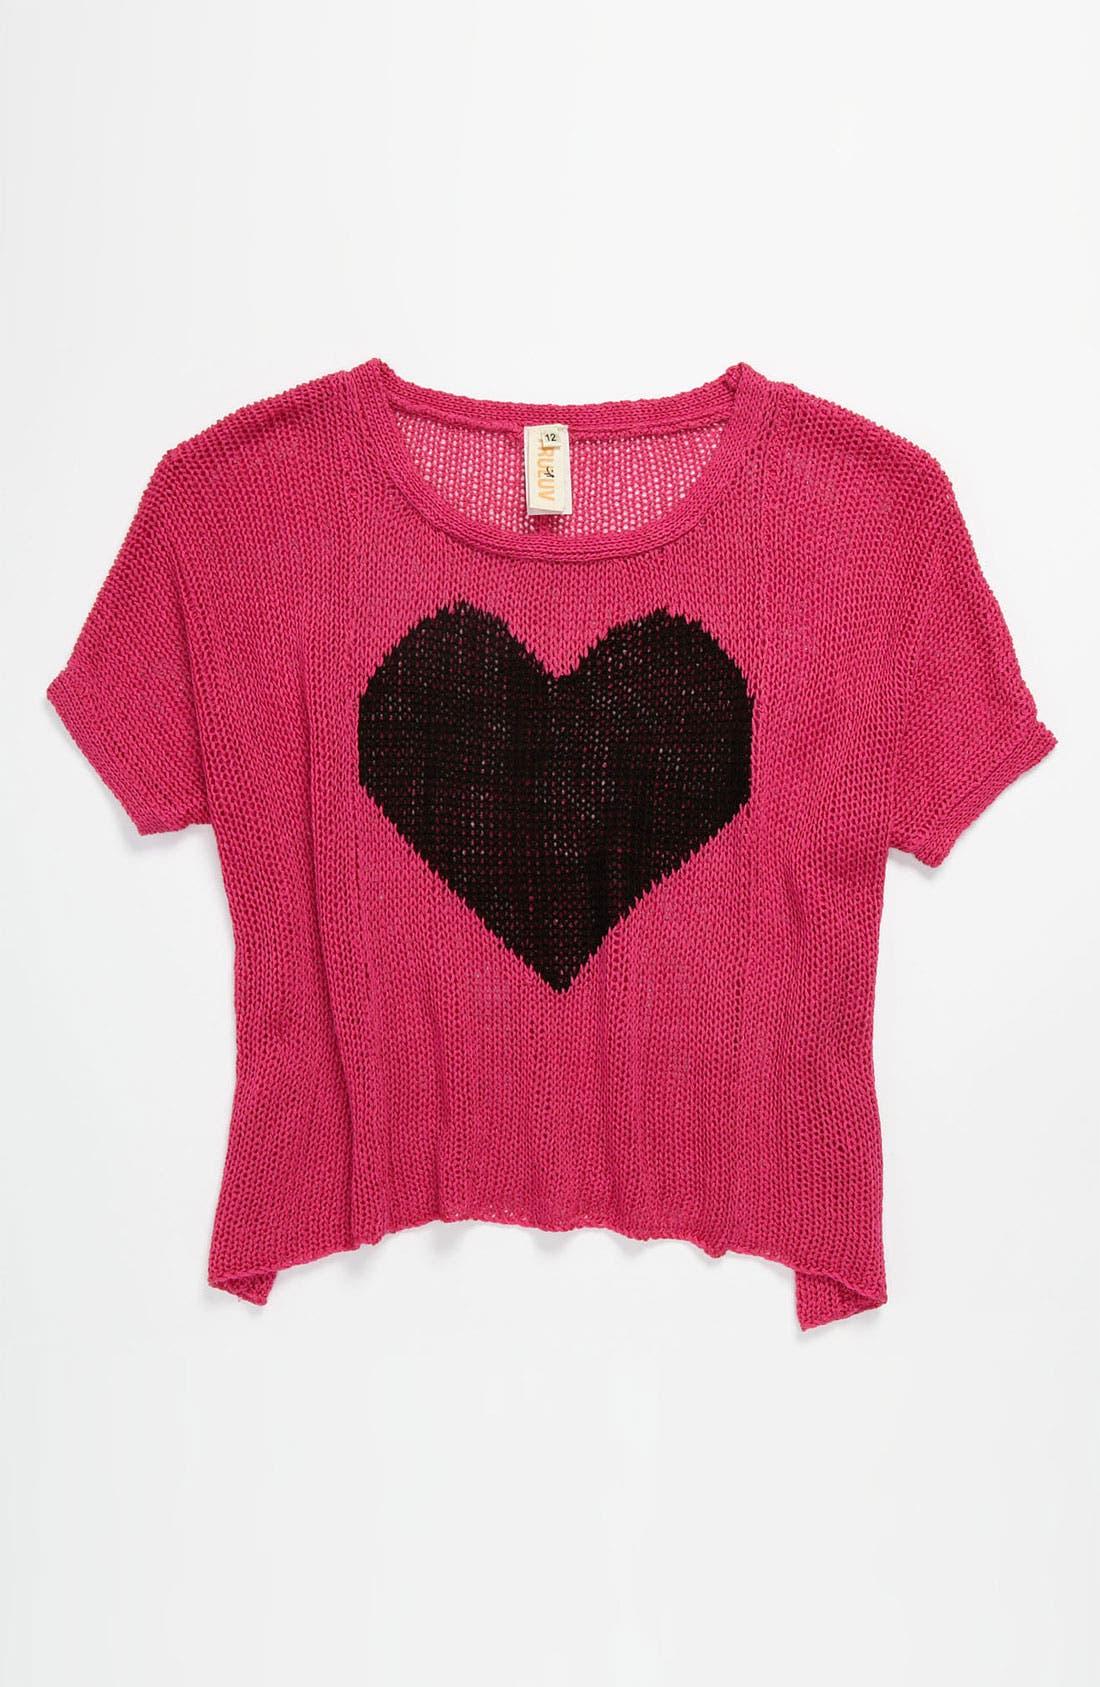 Alternate Image 1 Selected - Little Mass 'Heart' Sweater (Big Girls)